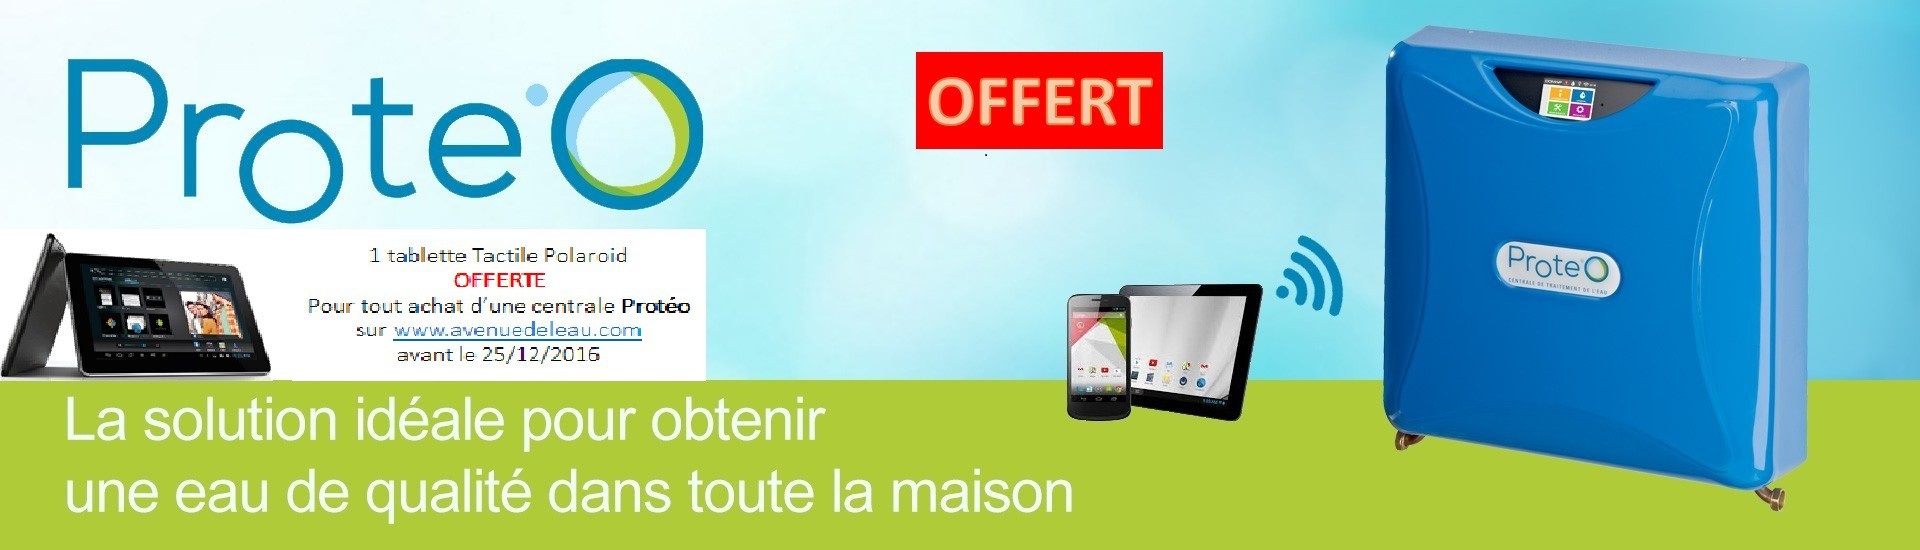 Offre tablette tactile offerte